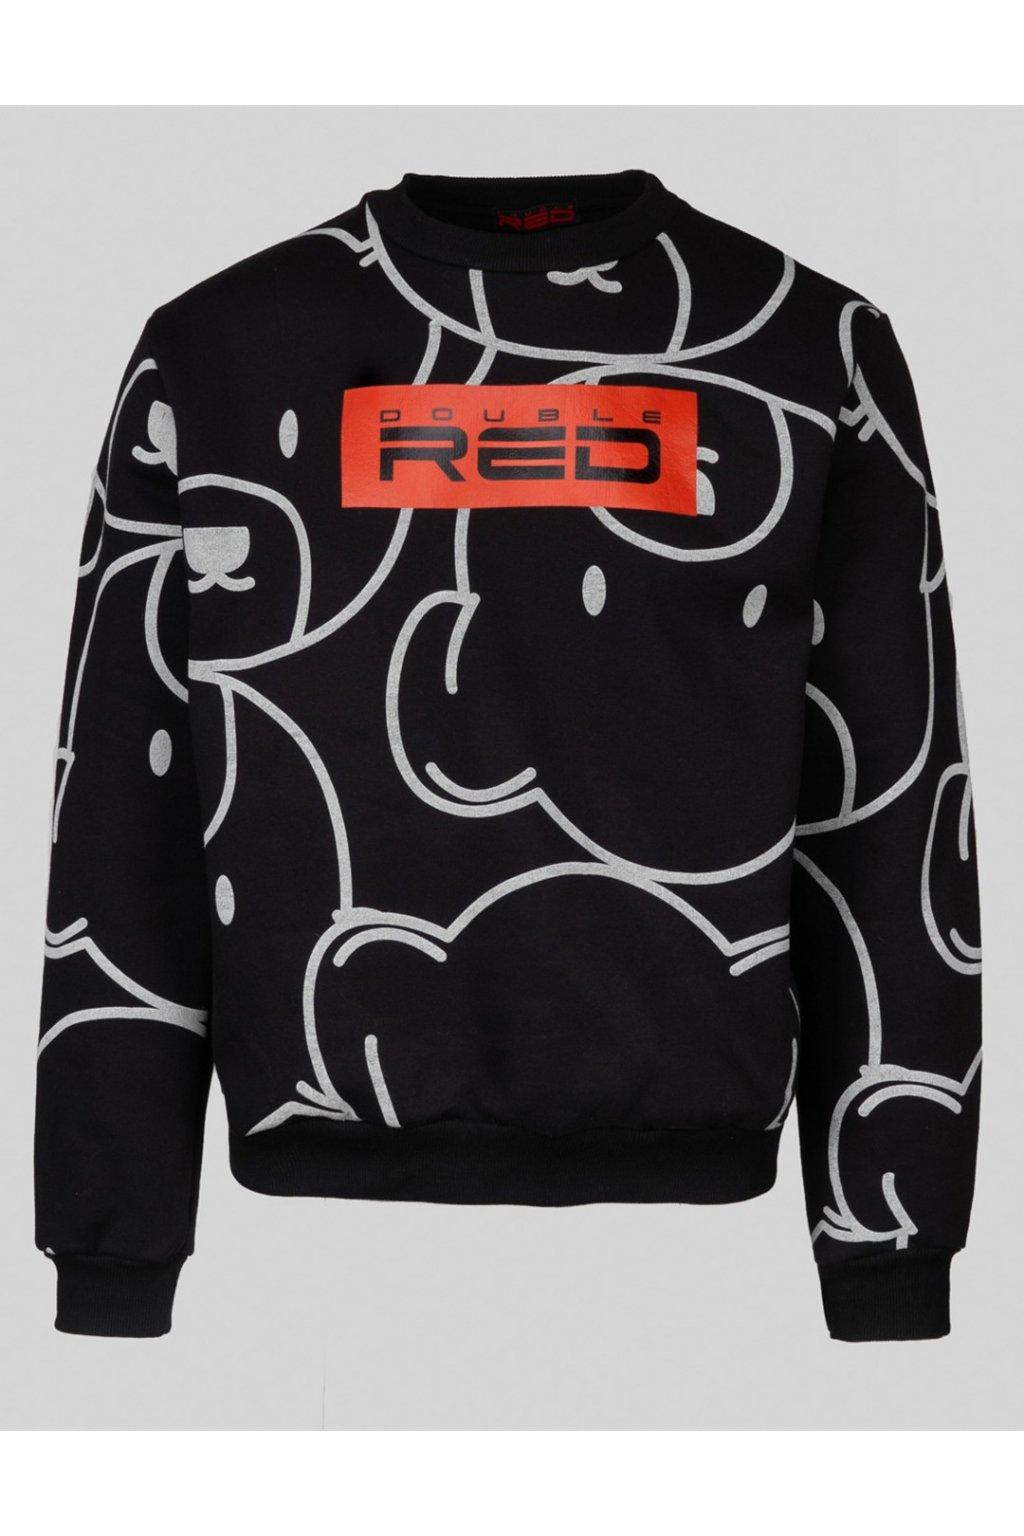 Double Red UNISEX mikina TEDDY Sweatshirt Black obr1